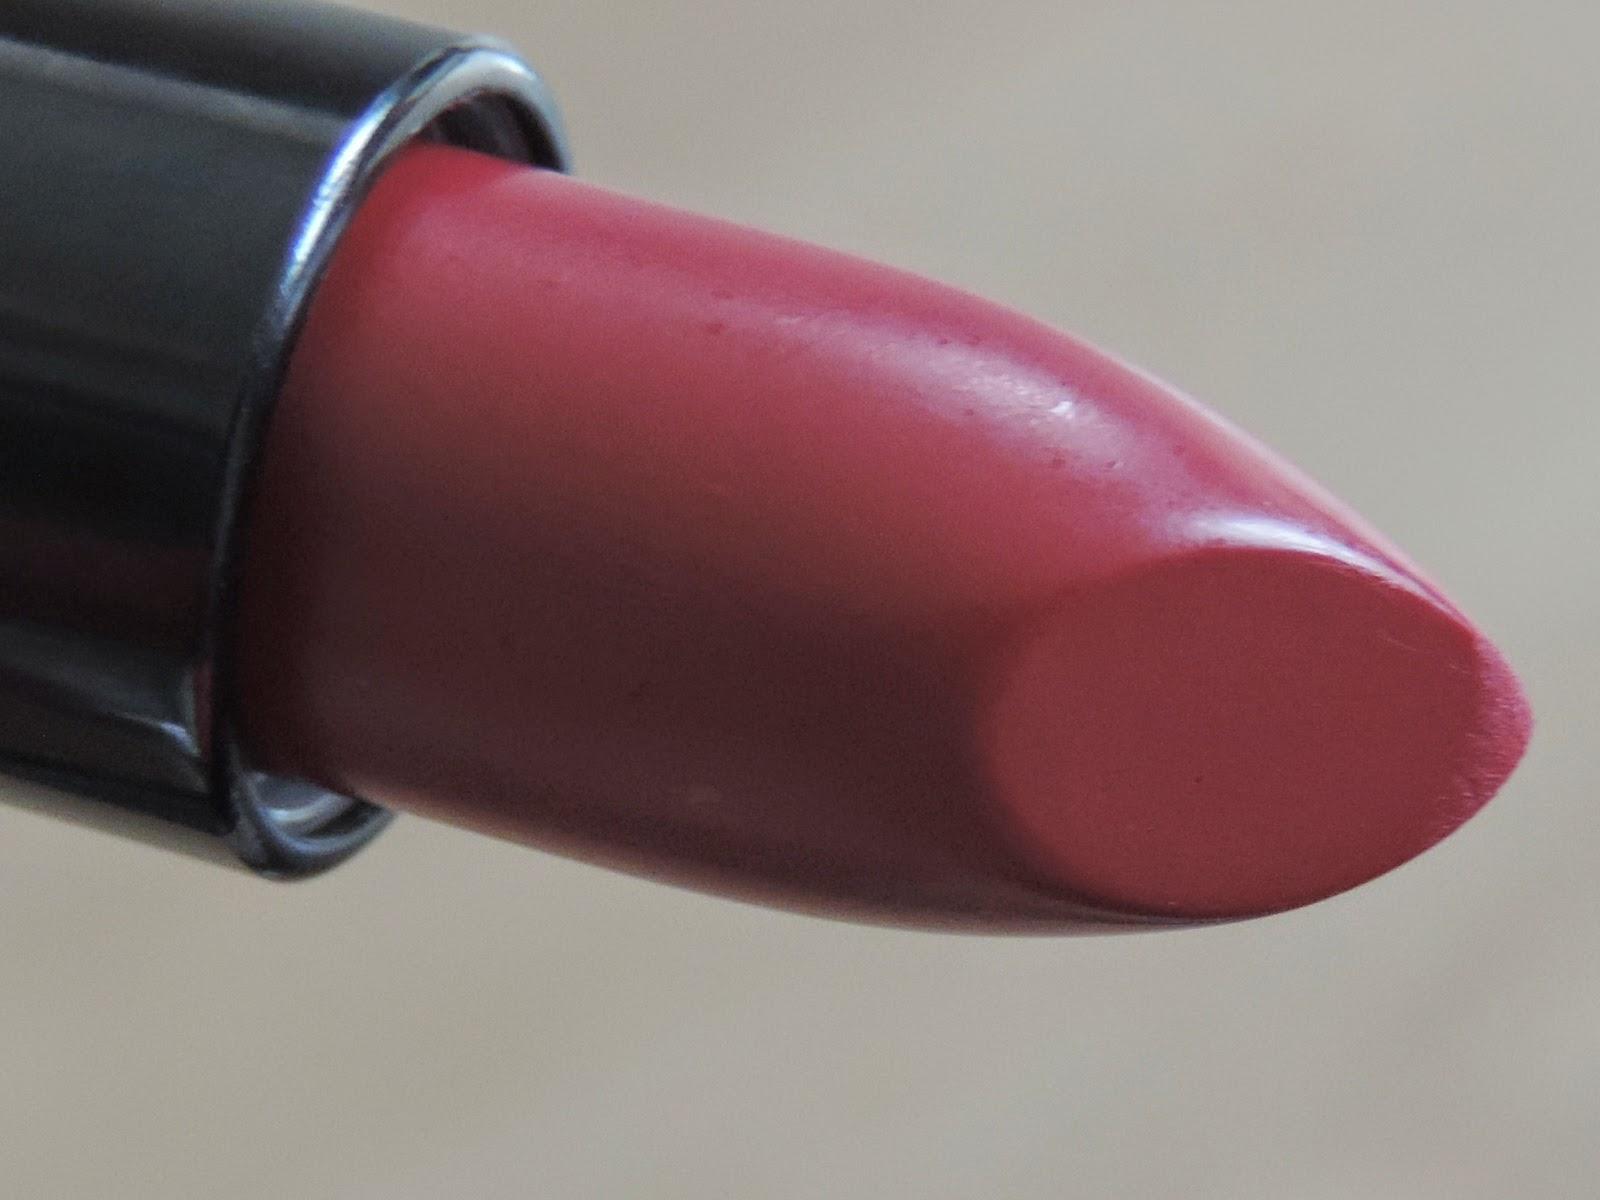 Rimmel Kate Moss Matte Lipstick in 107